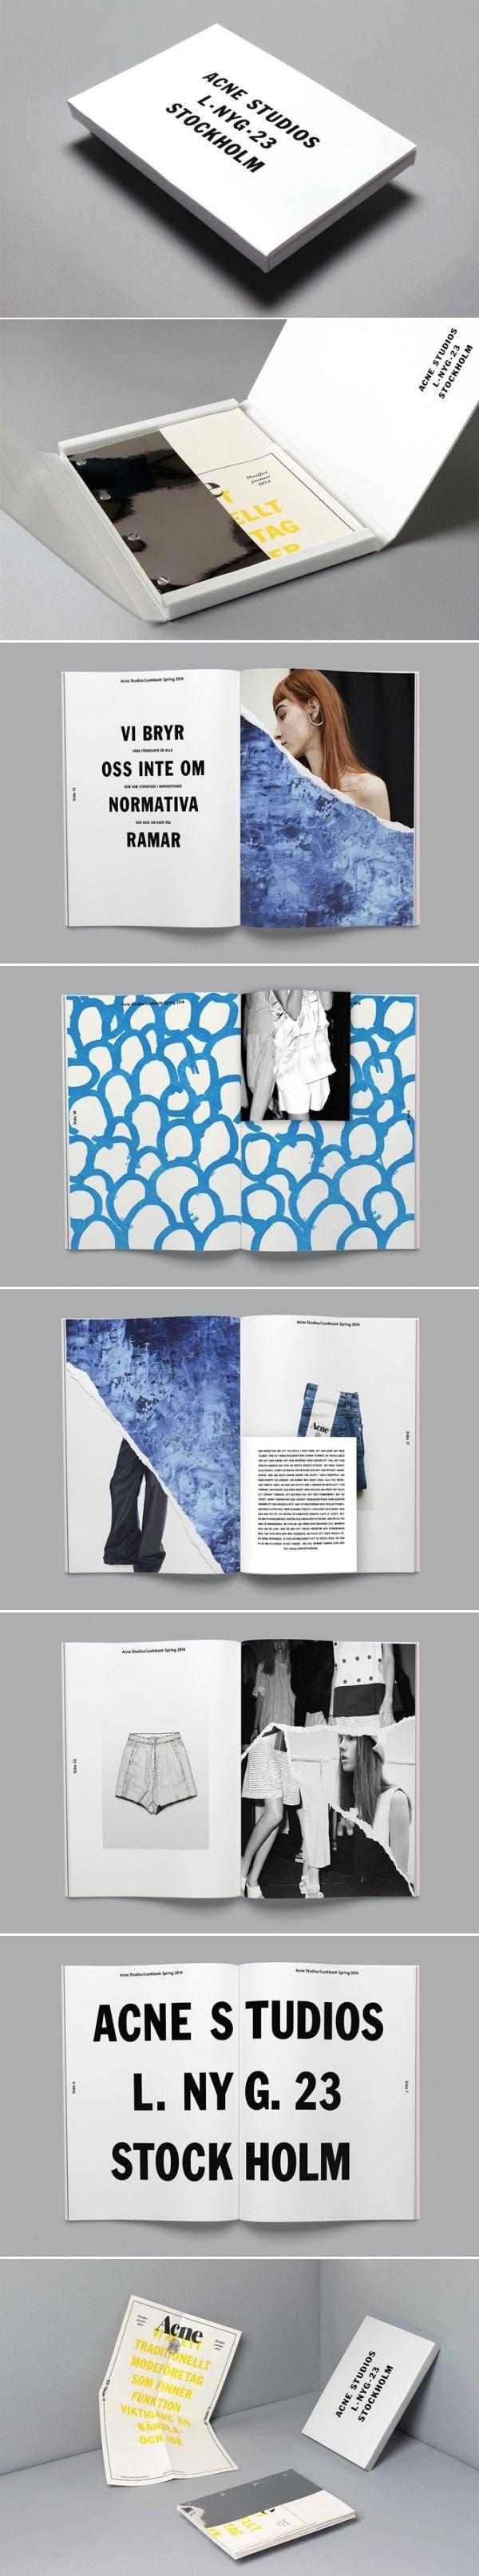 Acne Studios Promotional Book - Therese Ottem (Suède + Etats-Unis)